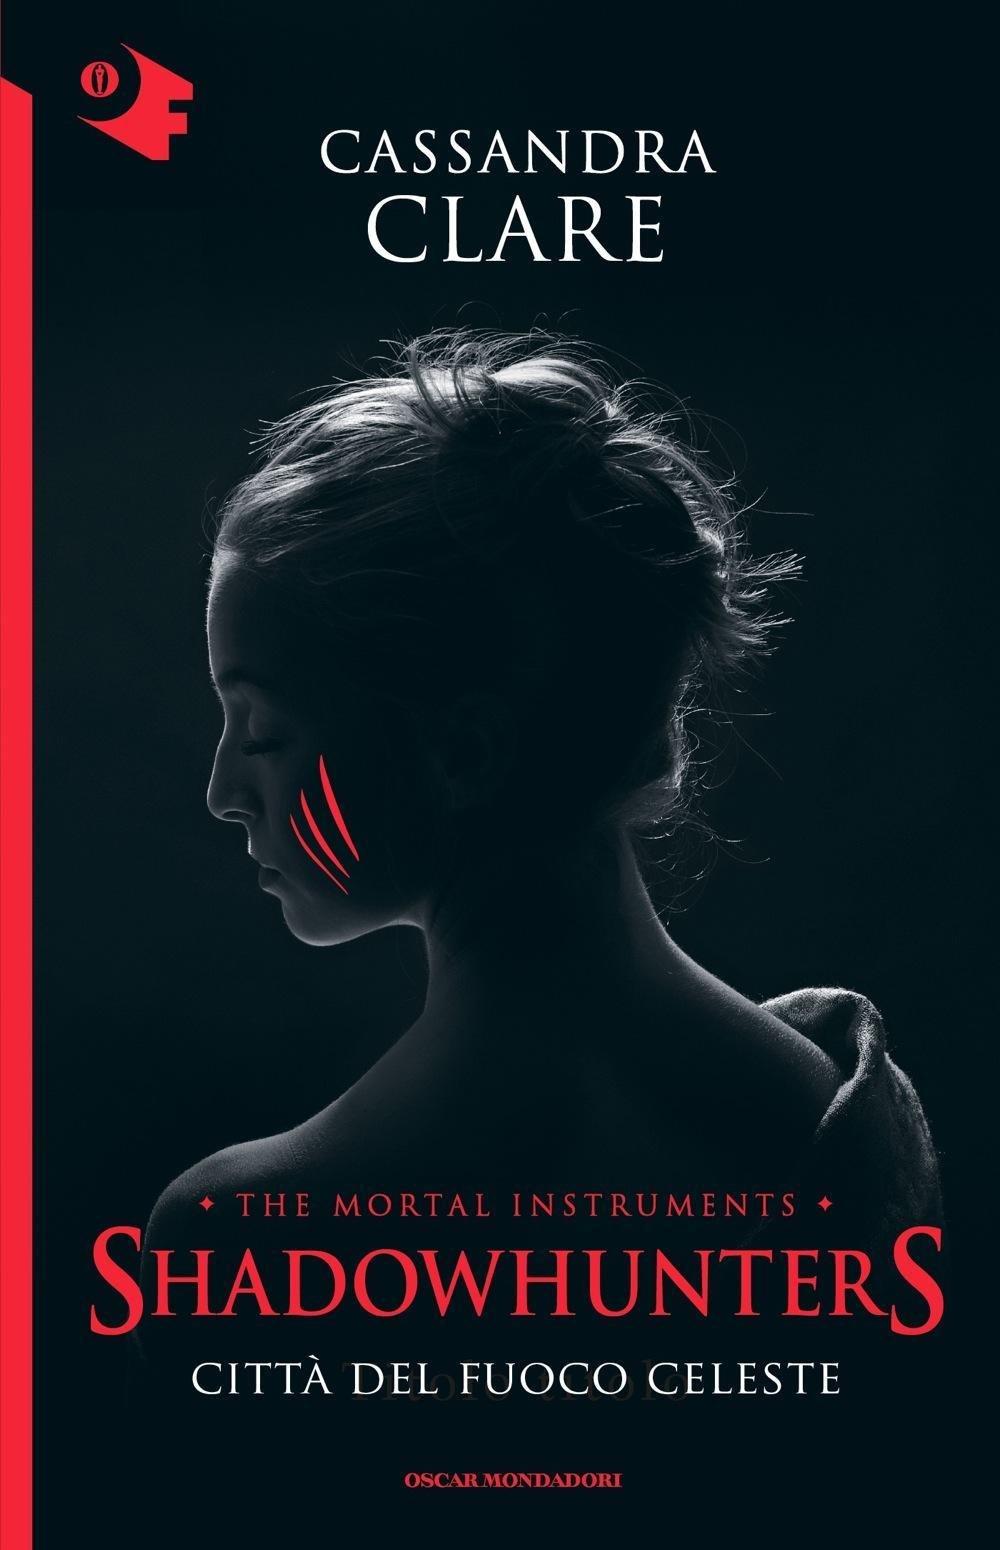 SHADOWHUNTERS – CITTA' DEL FUOCO CELESTE